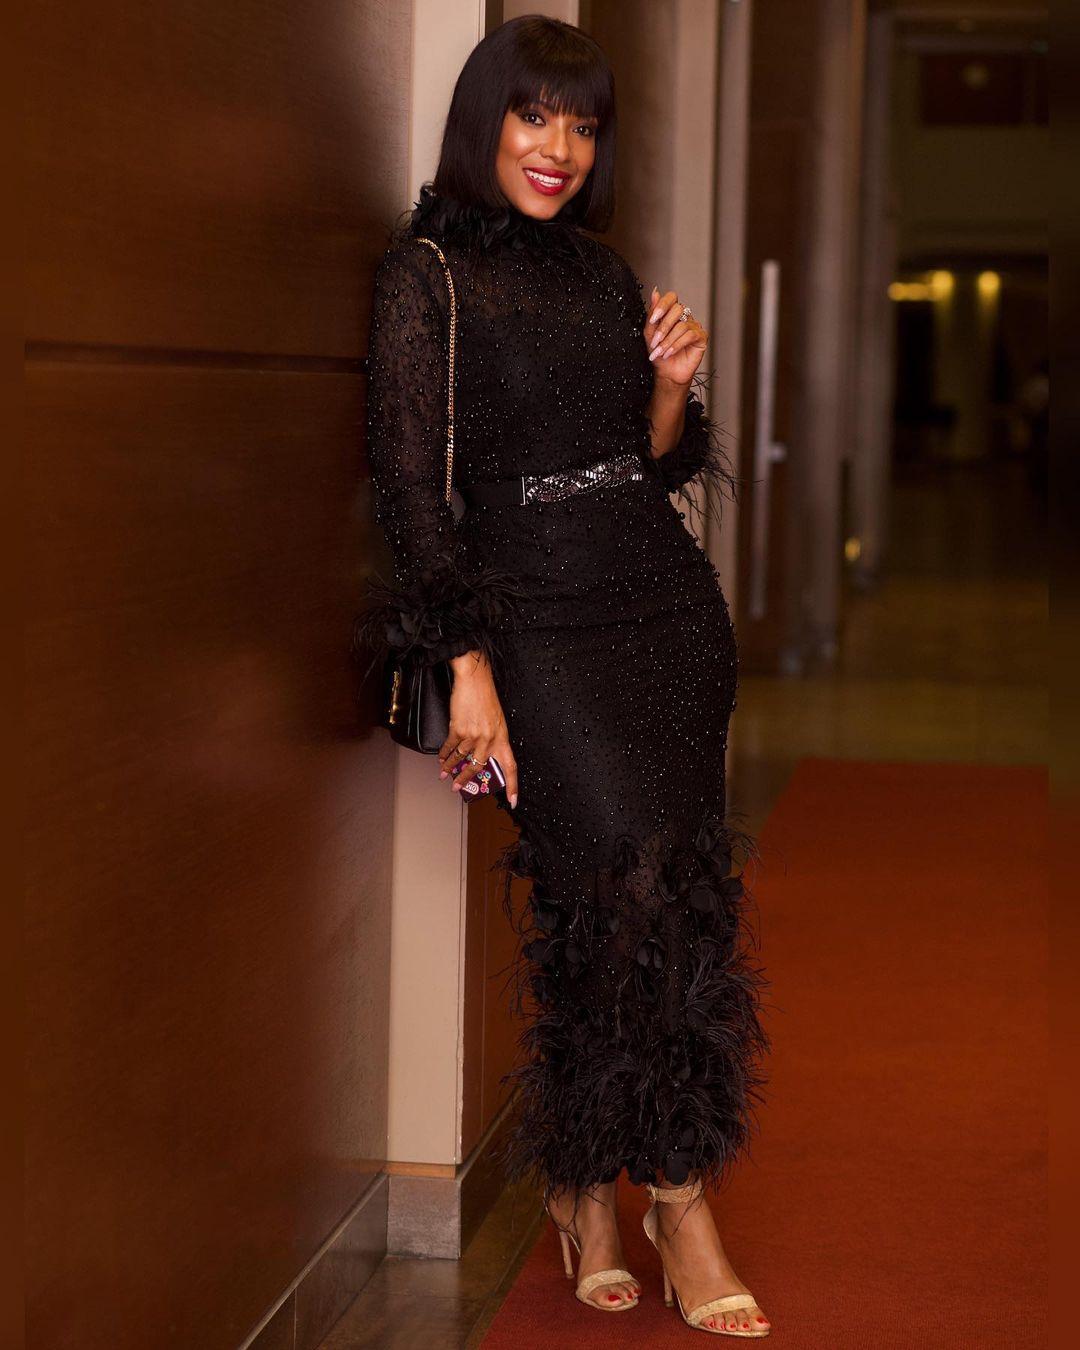 Joselyn Dumas Sets An Enviable Style Trend In Black